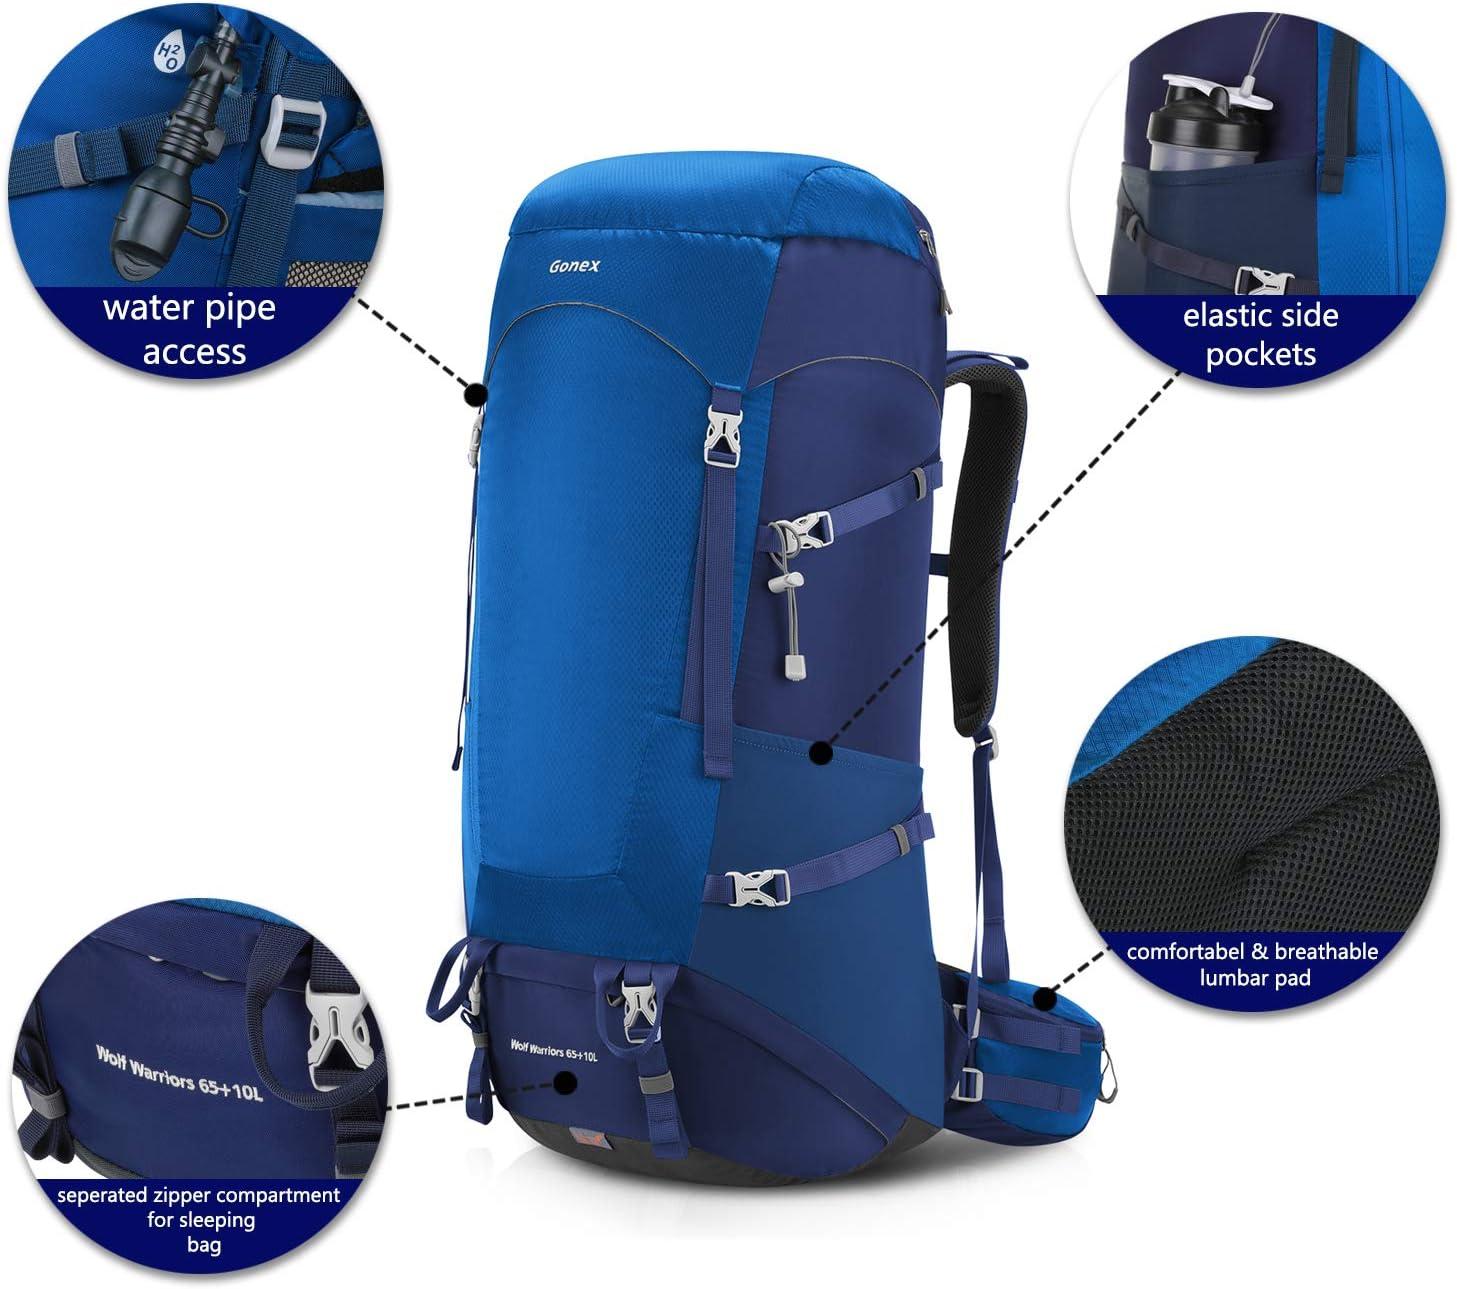 Mochila de Lluvia Gonex 65+10L Mochila de Senderismo al Aire Libre Viajes Senderismo Camping Incluye monta/ñismo